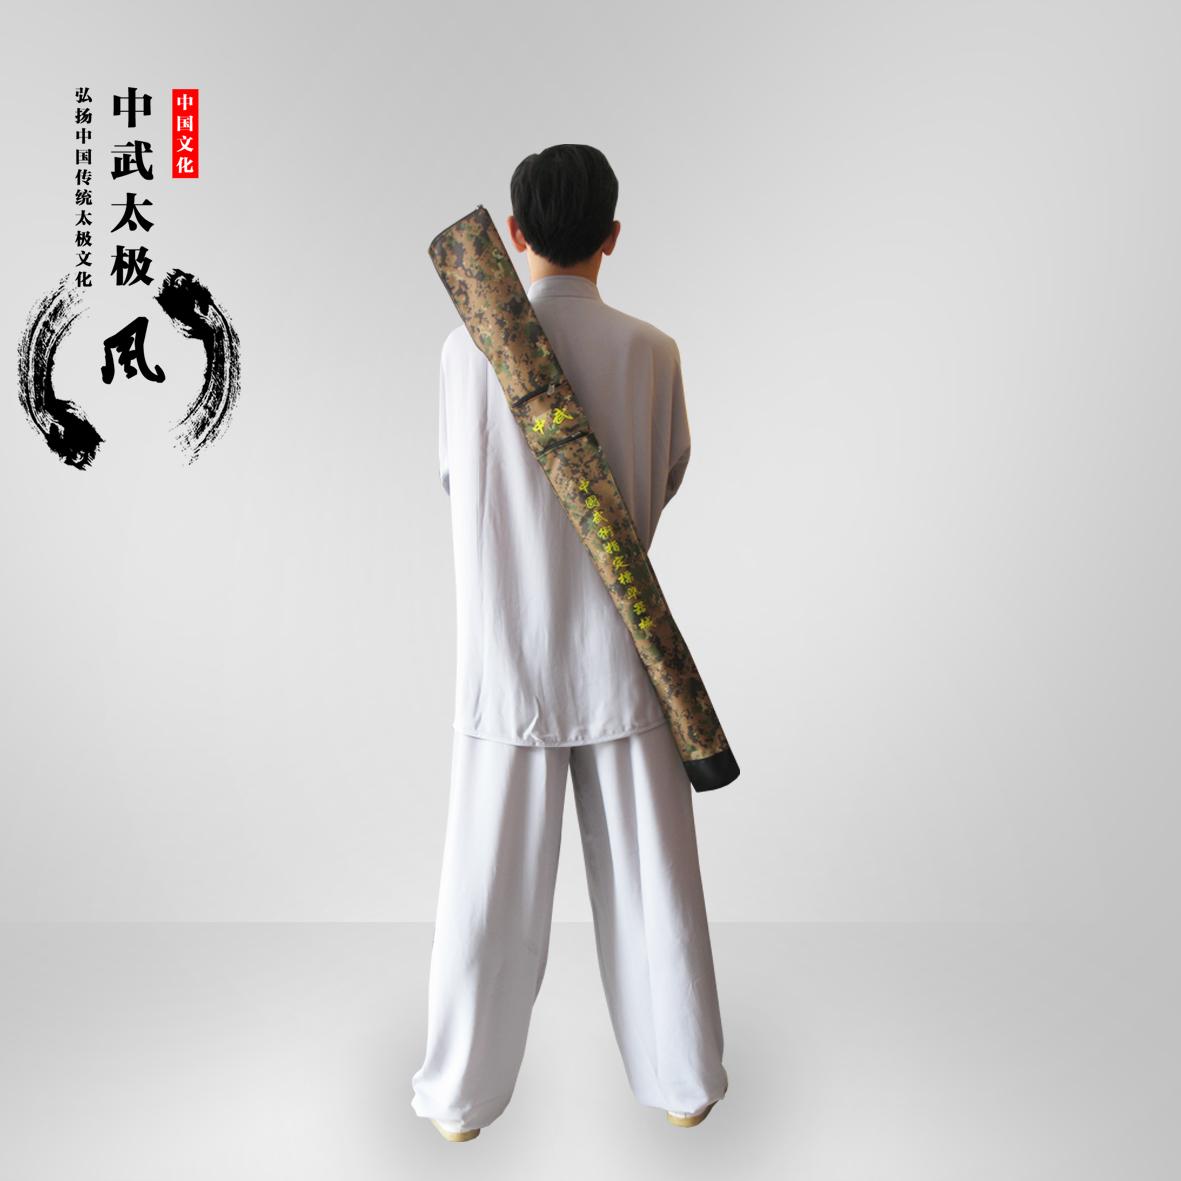 Beijing special Wu Tai Chi Sword Sword Sword bag cloth single tendon thickening multifunctional Wushu sword bag<br><br>Aliexpress